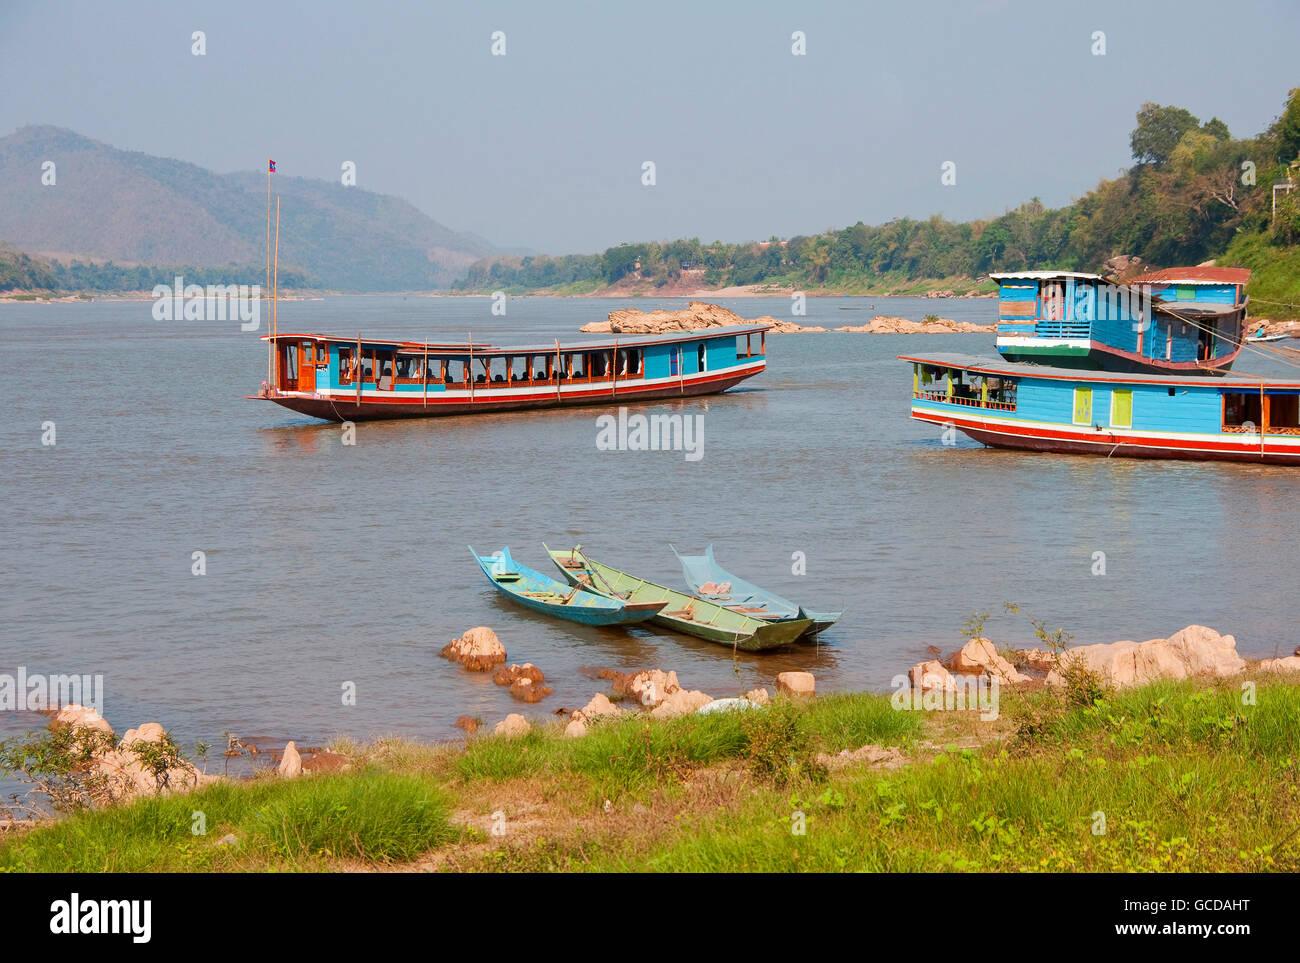 Barcos cerca del Río Mekong en Luang Prabang, Laos. Imagen De Stock